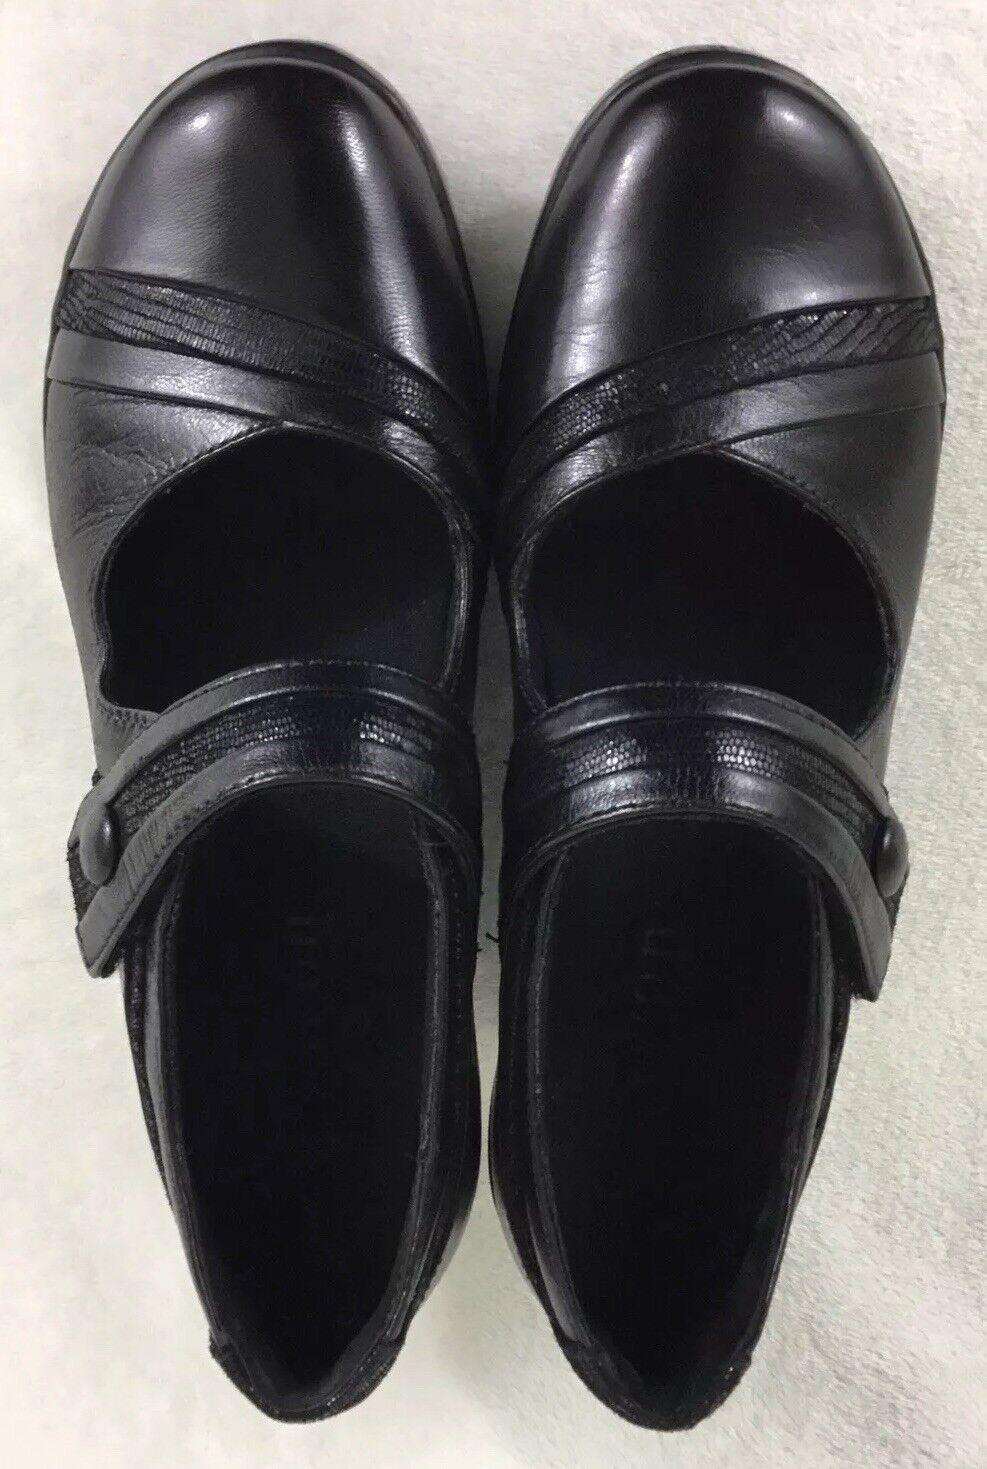 Aravon Anna Women's Black Leather Mary Jane Shoes WSA04BK Size 8B EUC